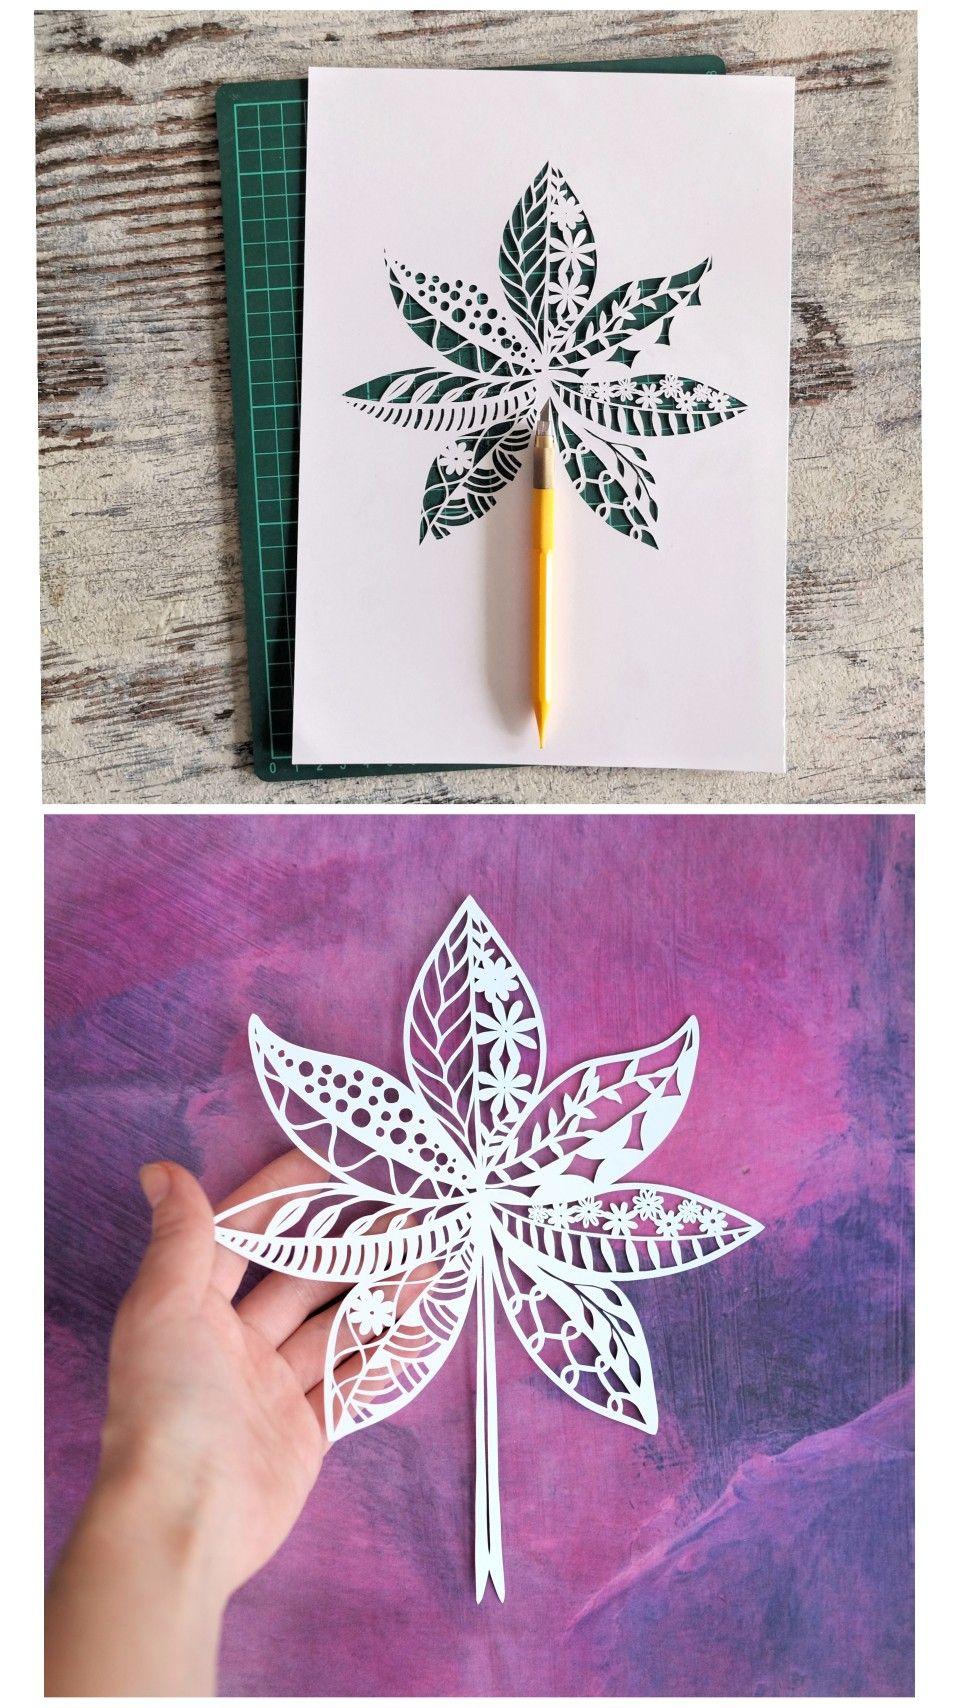 Photo of Paper cut art by Antonina Luchinina